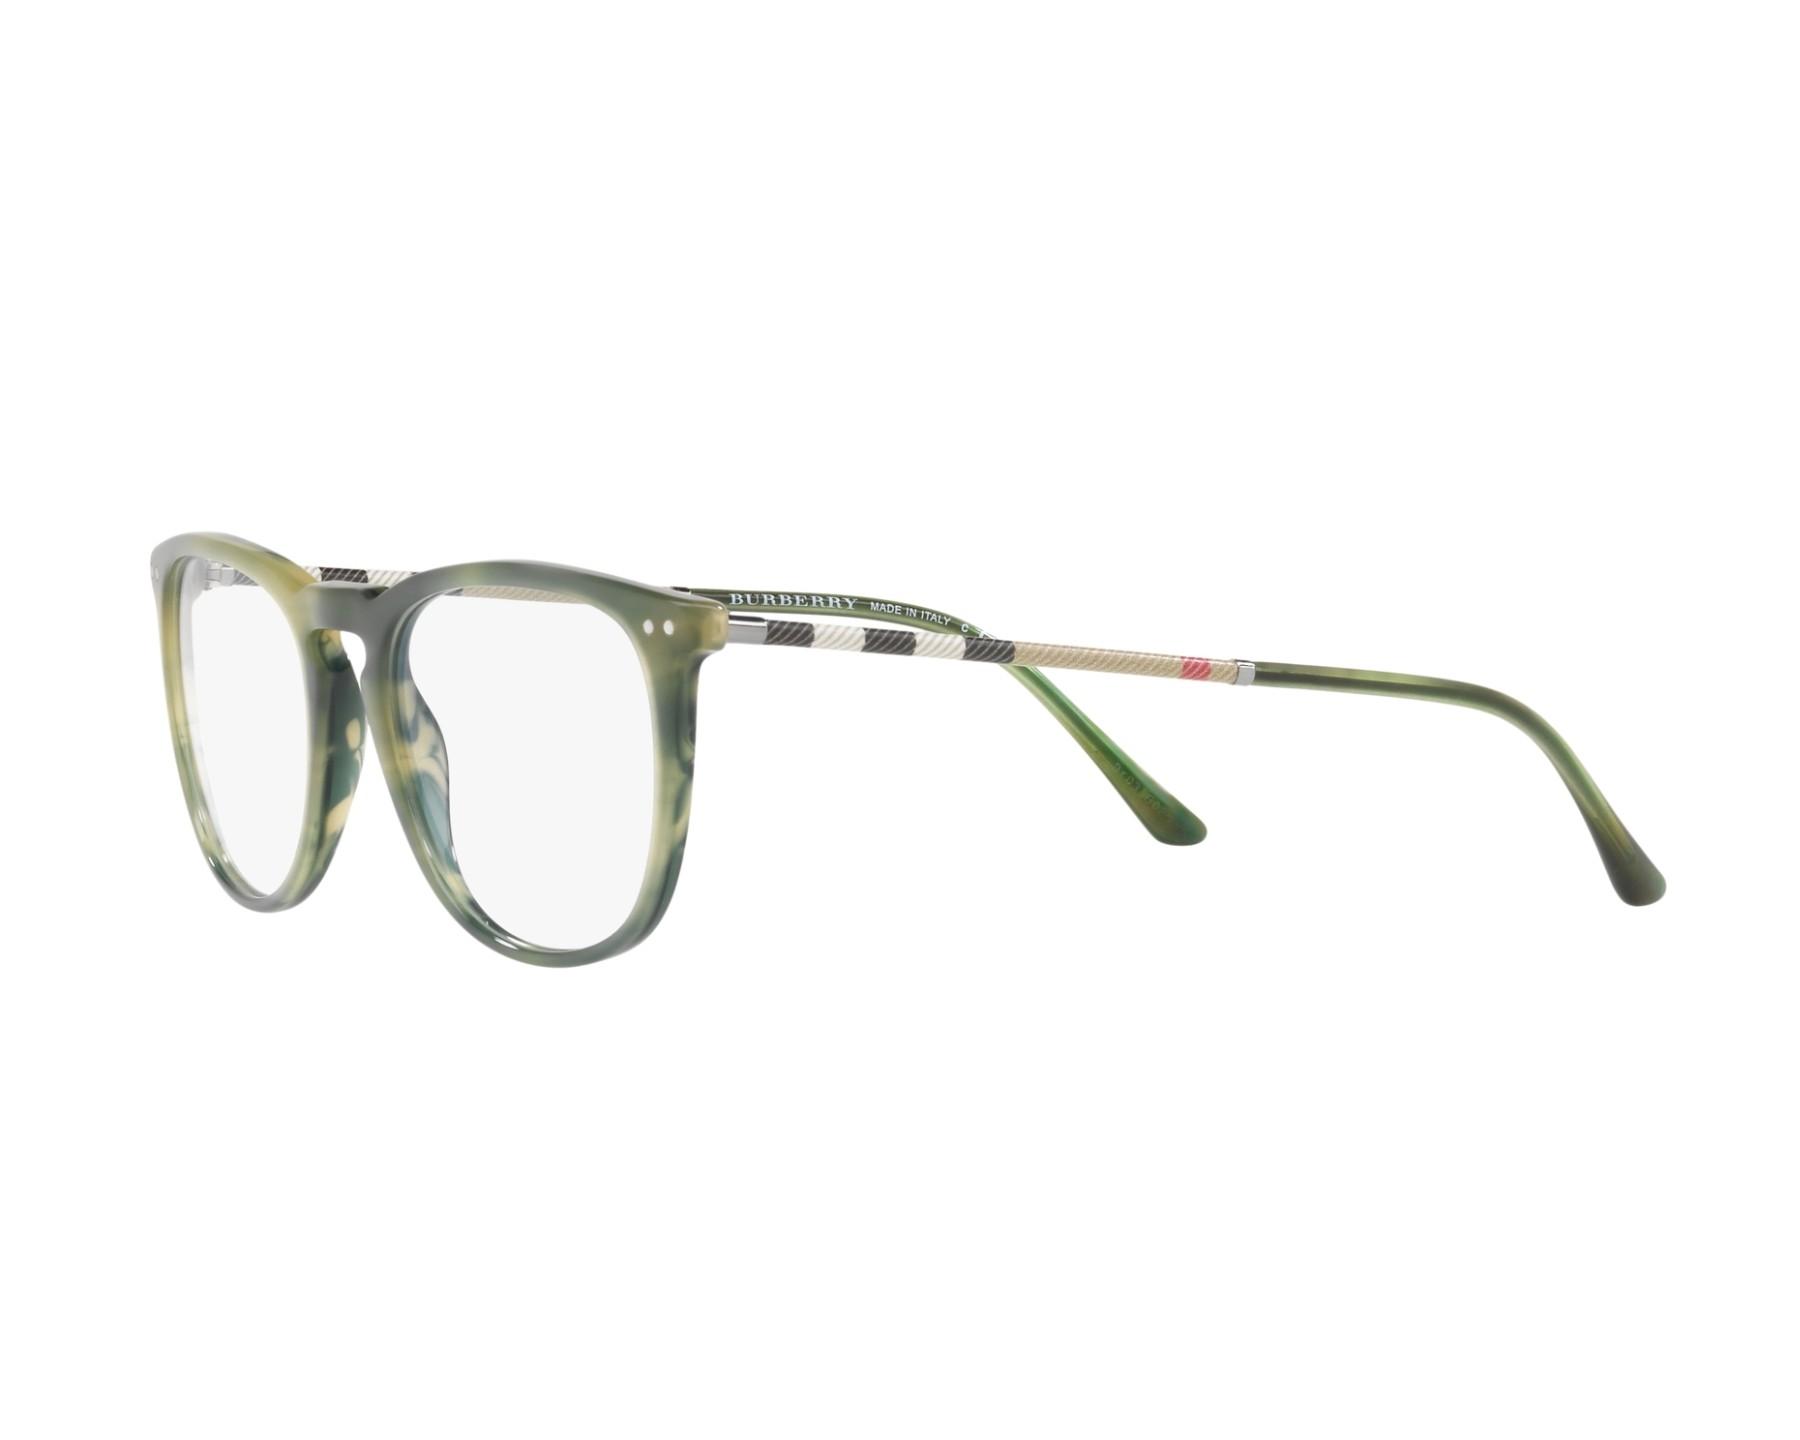 Burberry Eyeglasses Be Q Green